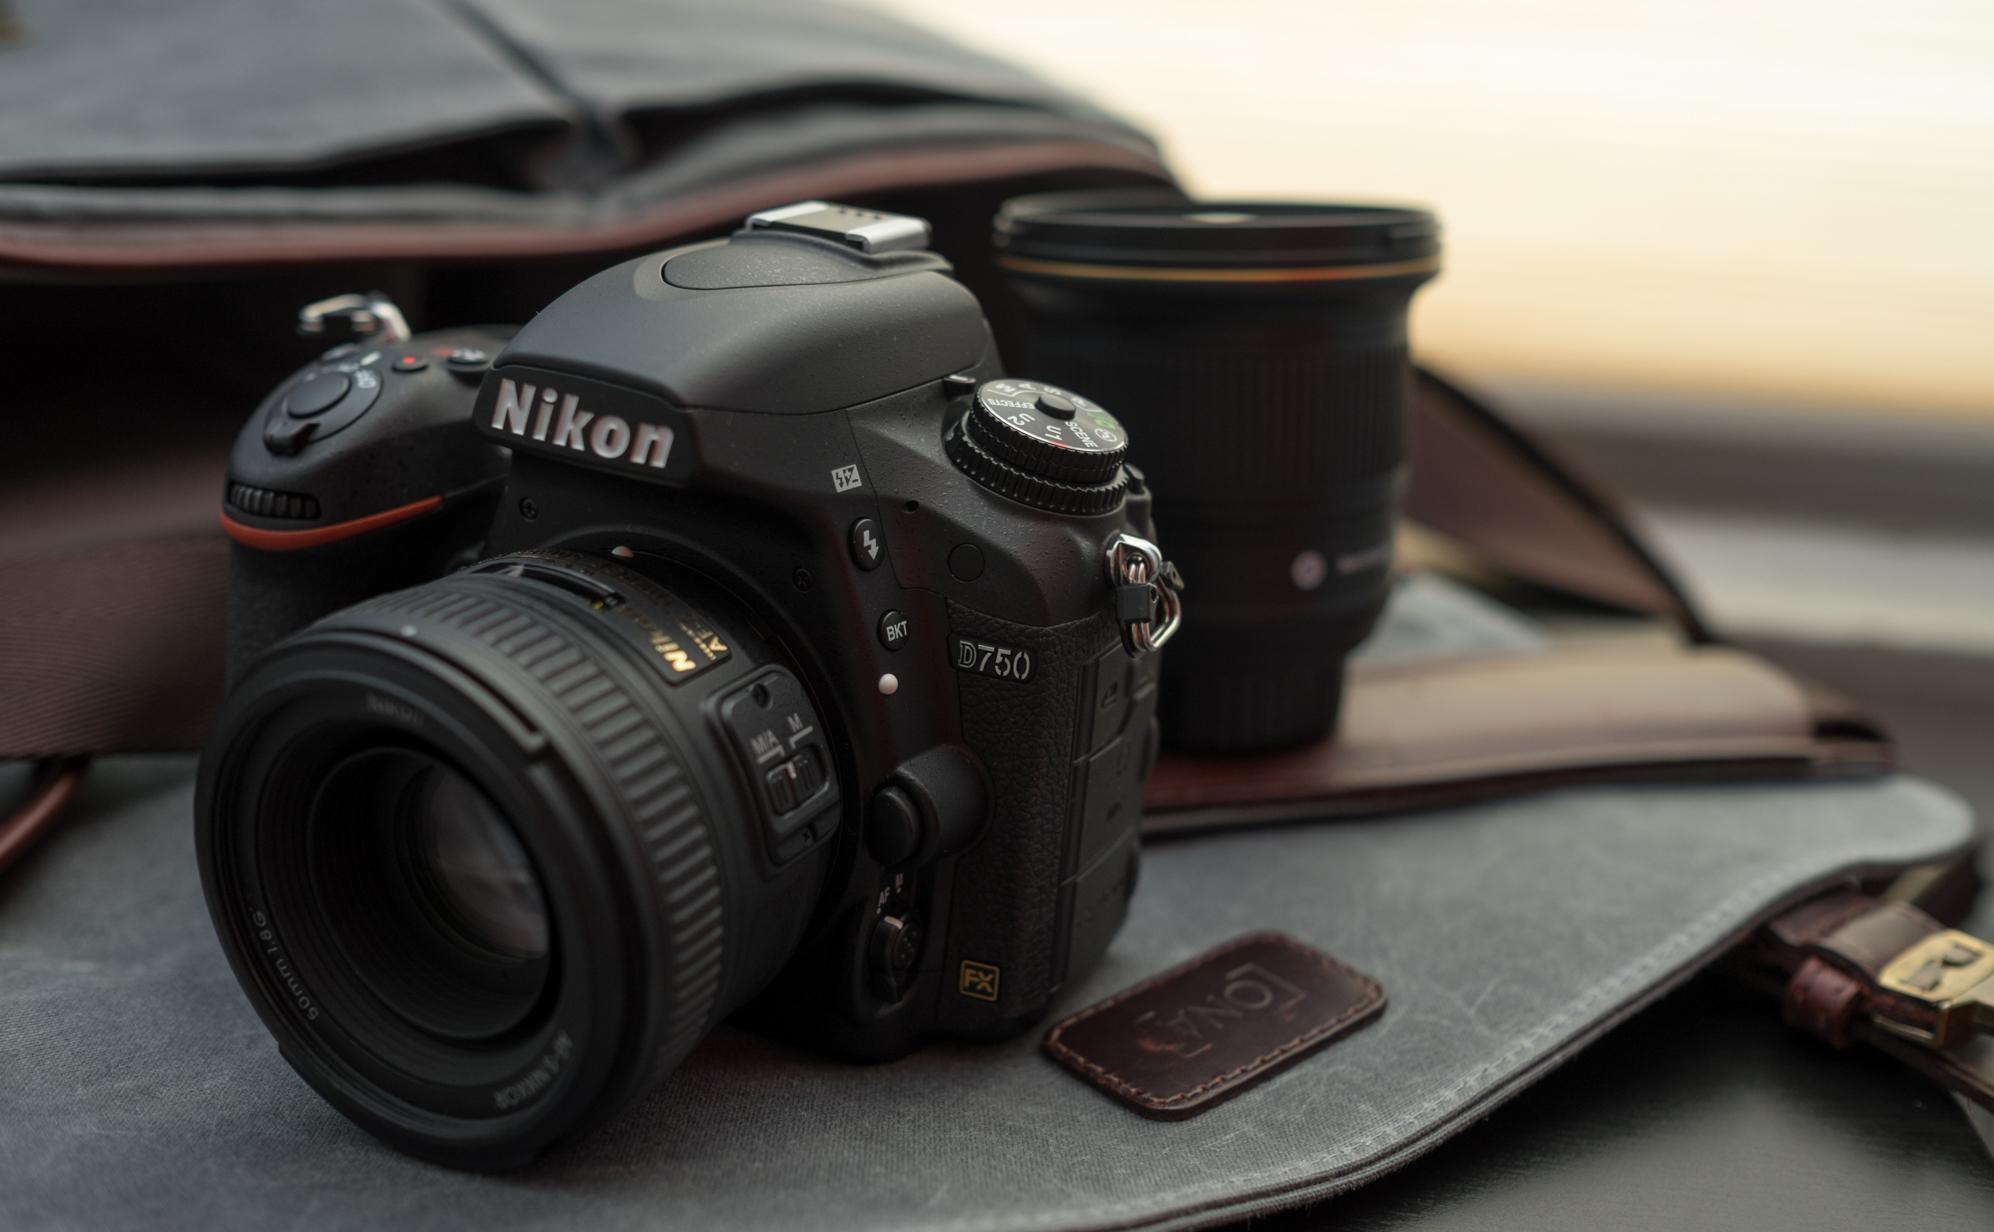 Mejores cámaras fotográficas profesionales: Nikon D750